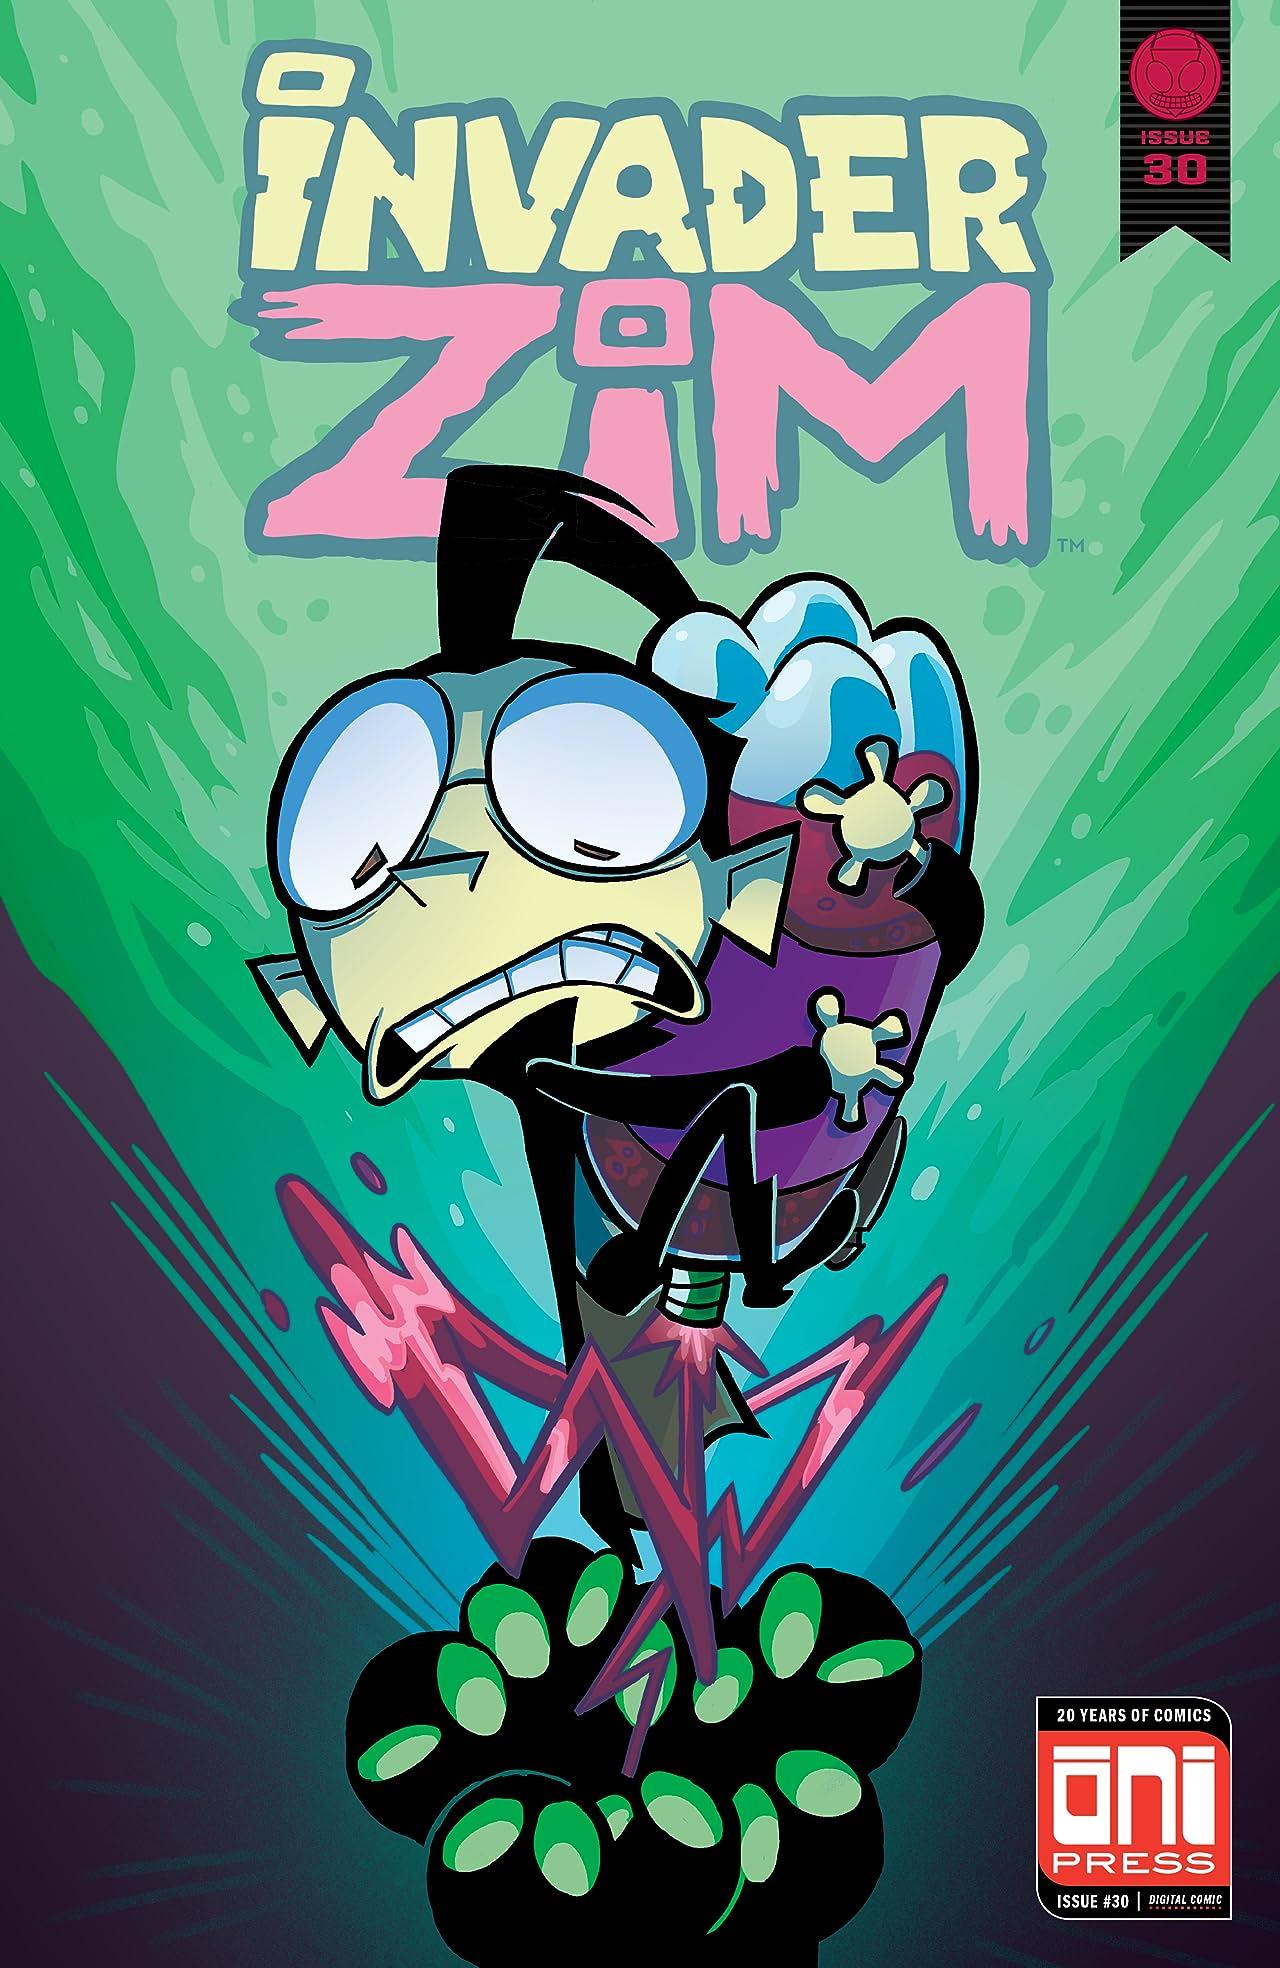 Invader Zim #30